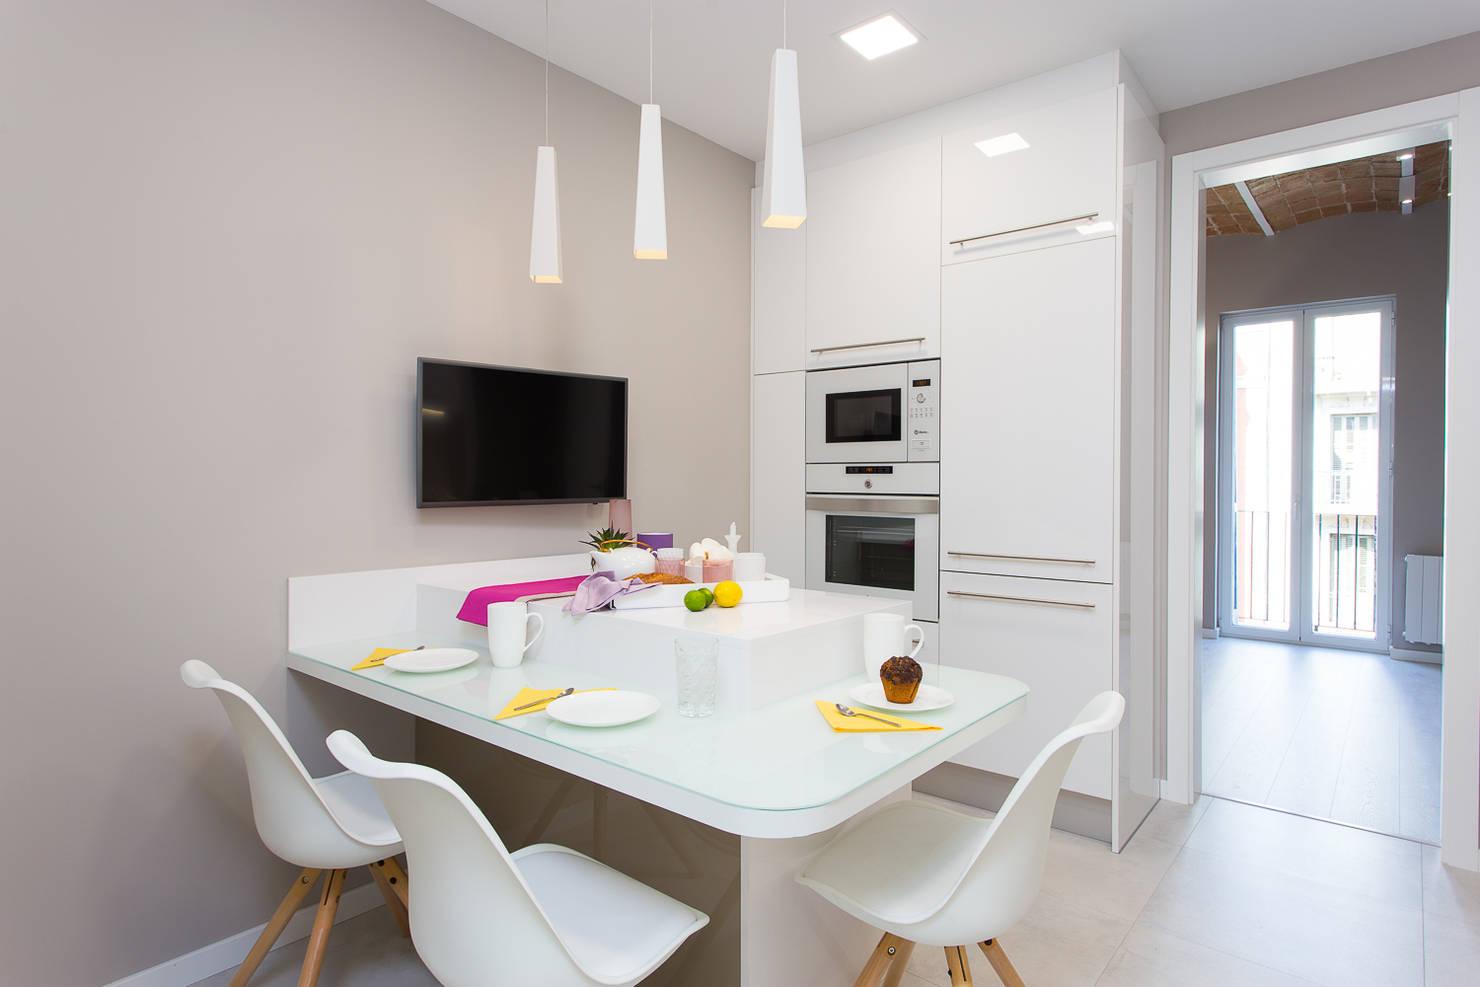 Kitchen Interior - cover